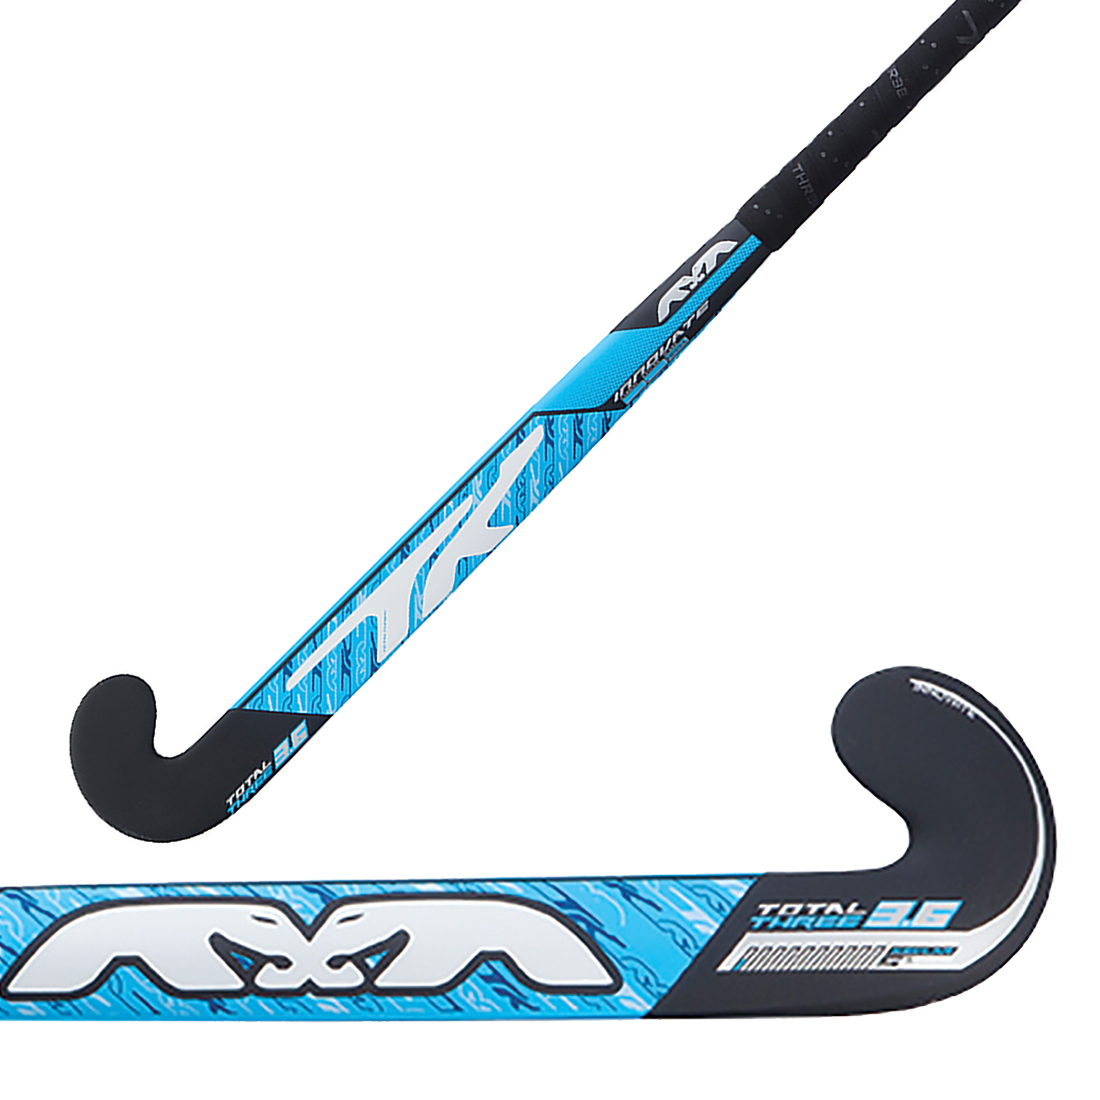 TK Total 2.5 Innovate Field Hockey Stick